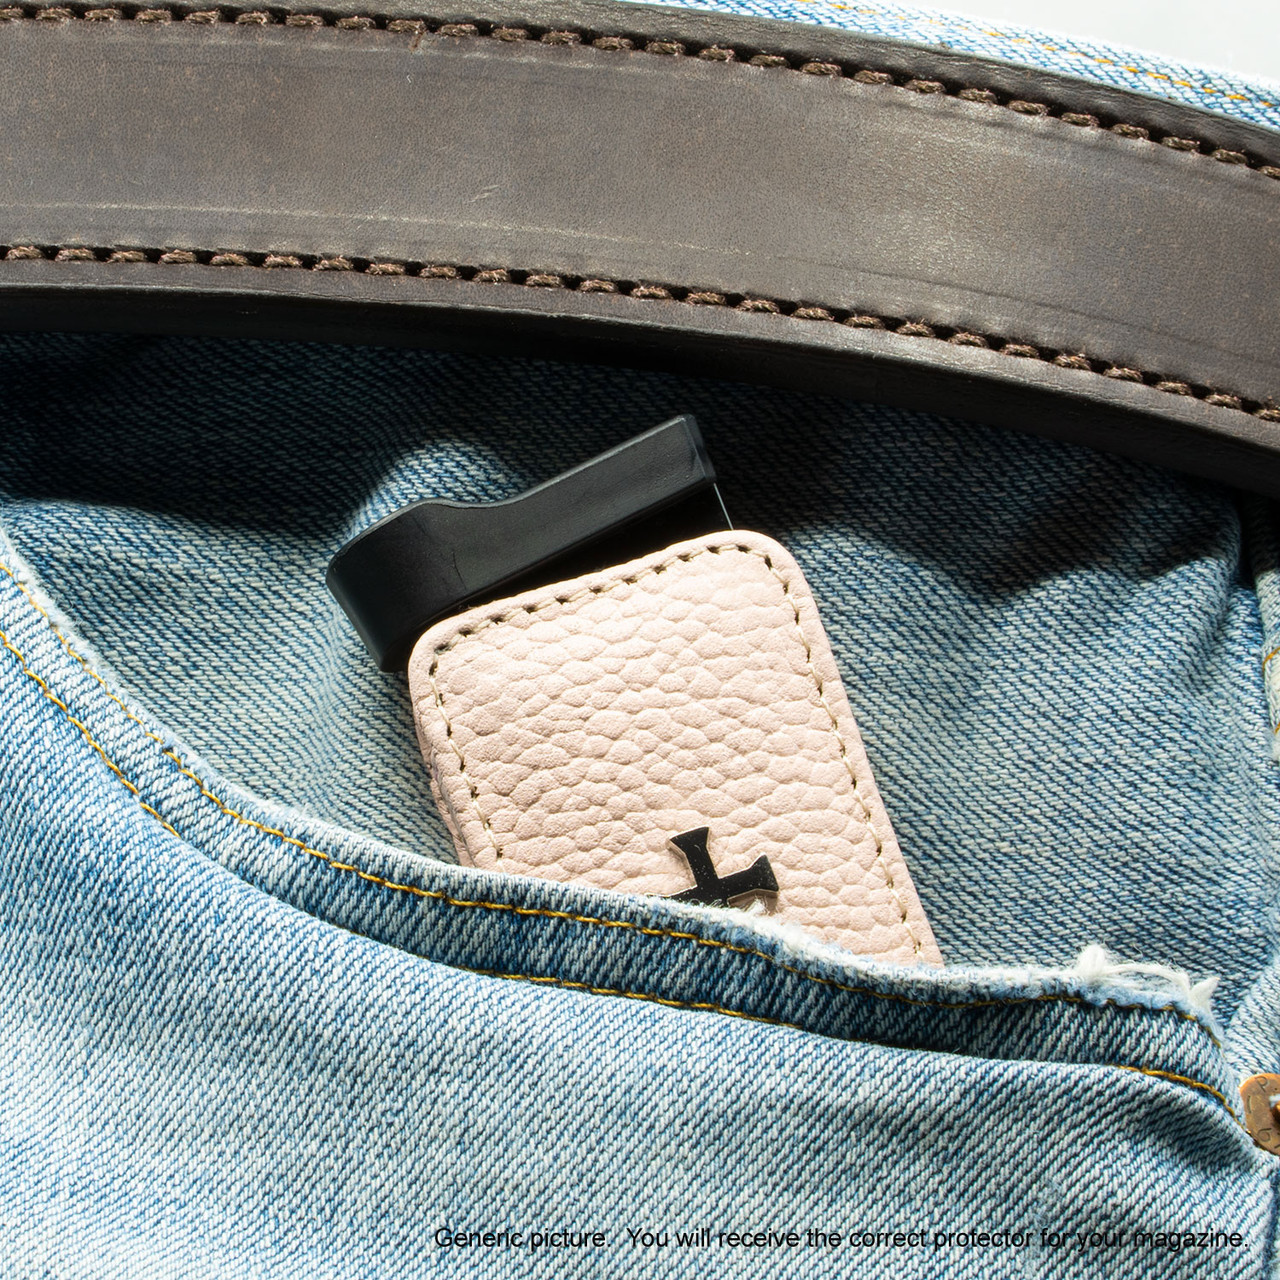 Taurus Millennium Pro 140 Pink Carry Faithfully Cross Magazine Pocket Protector